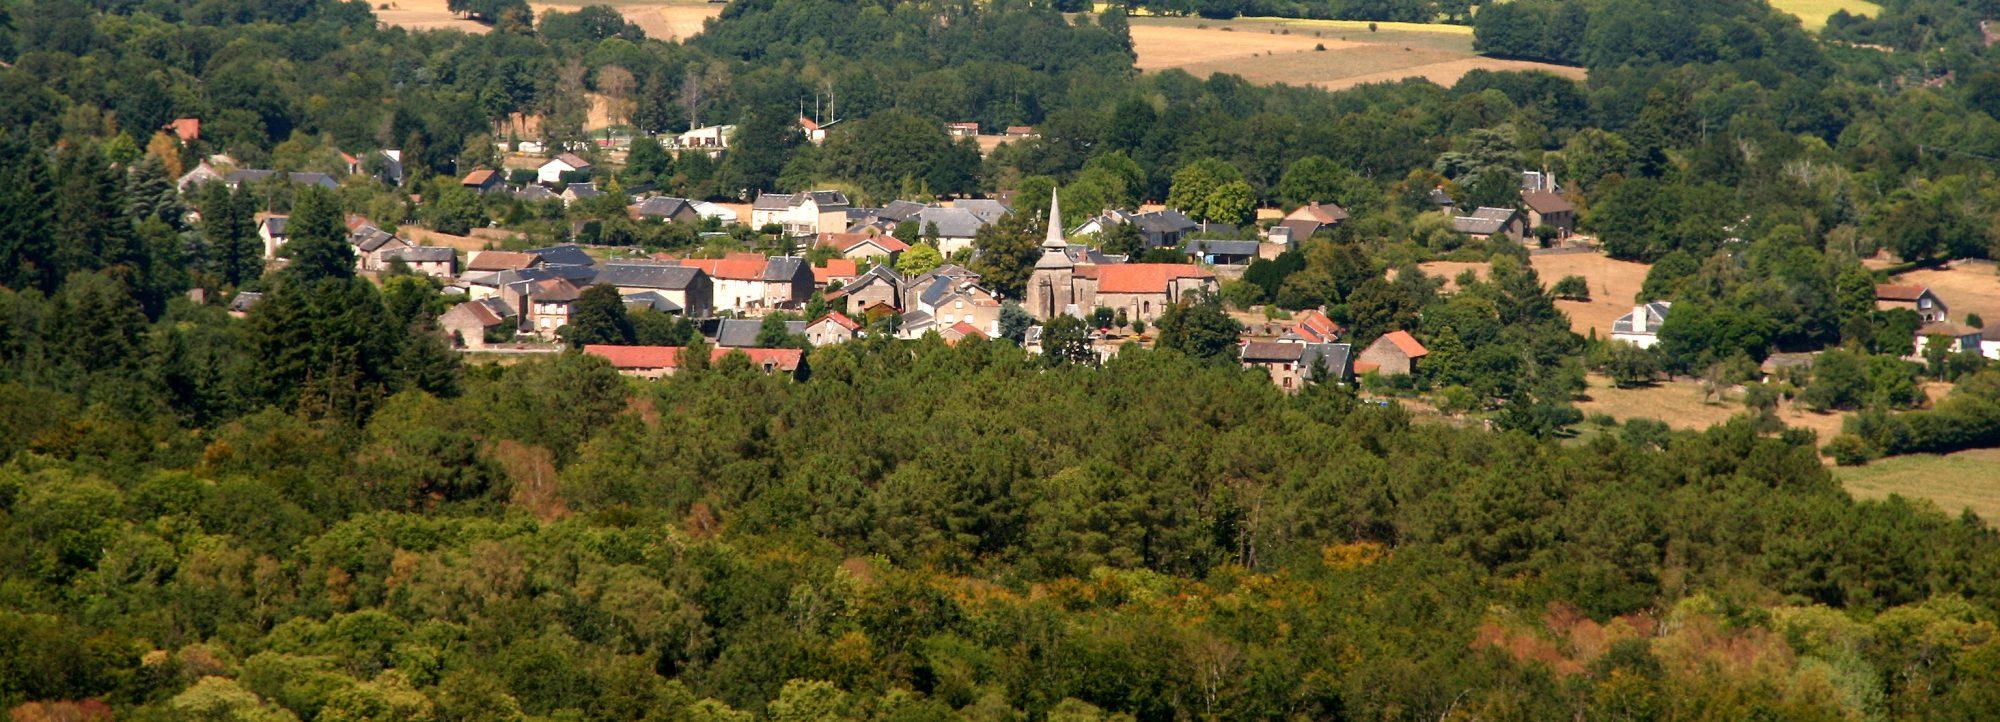 Bersac sur Rivalier (87)